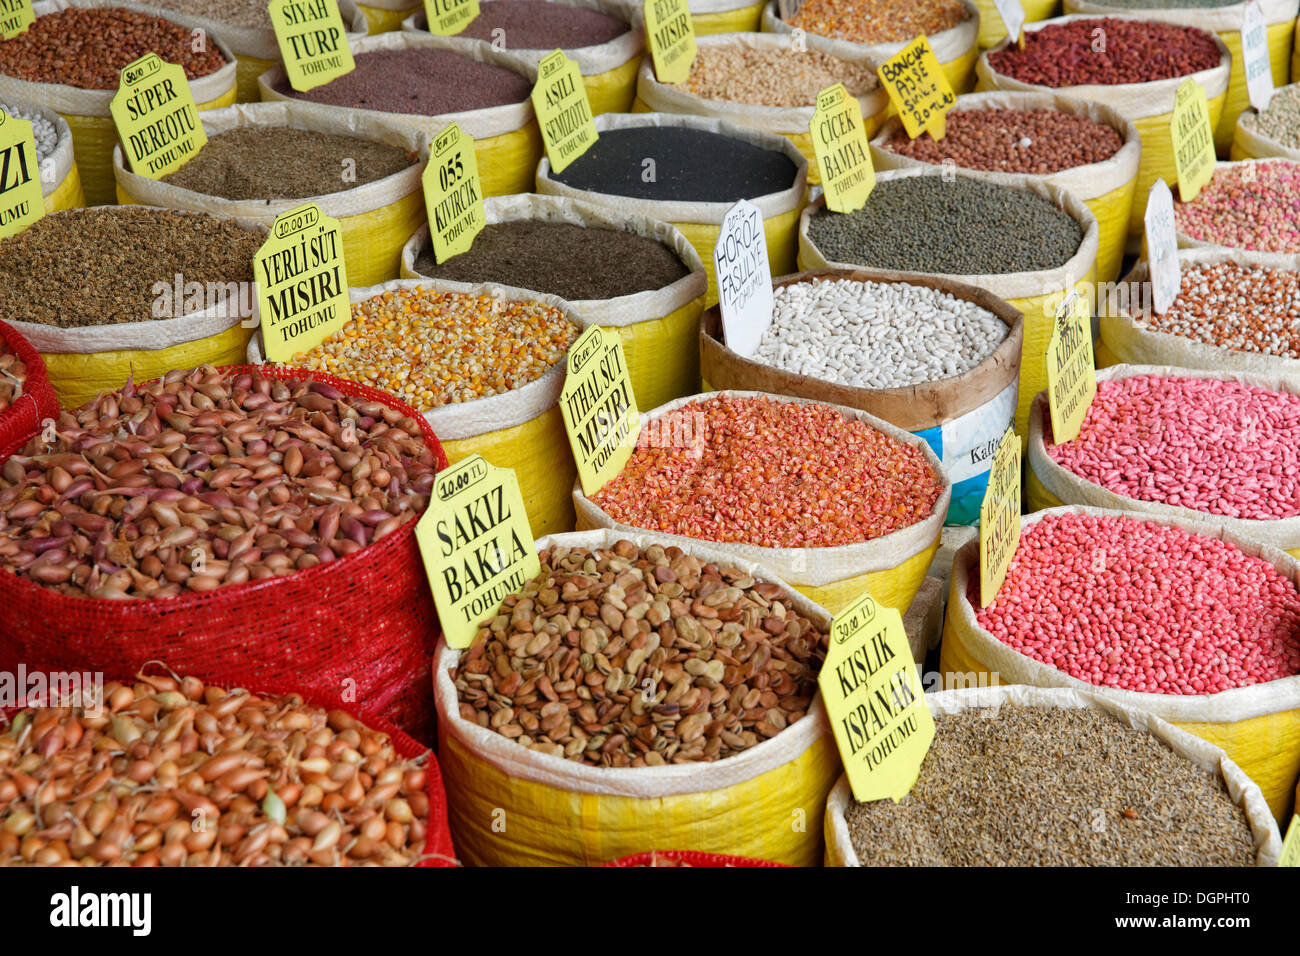 Various beans and corn in bags, Egyptian Bazaar, or Spice Bazaar, Misir Çarşısı, Eminönü, Istanbul, European side - Stock Image